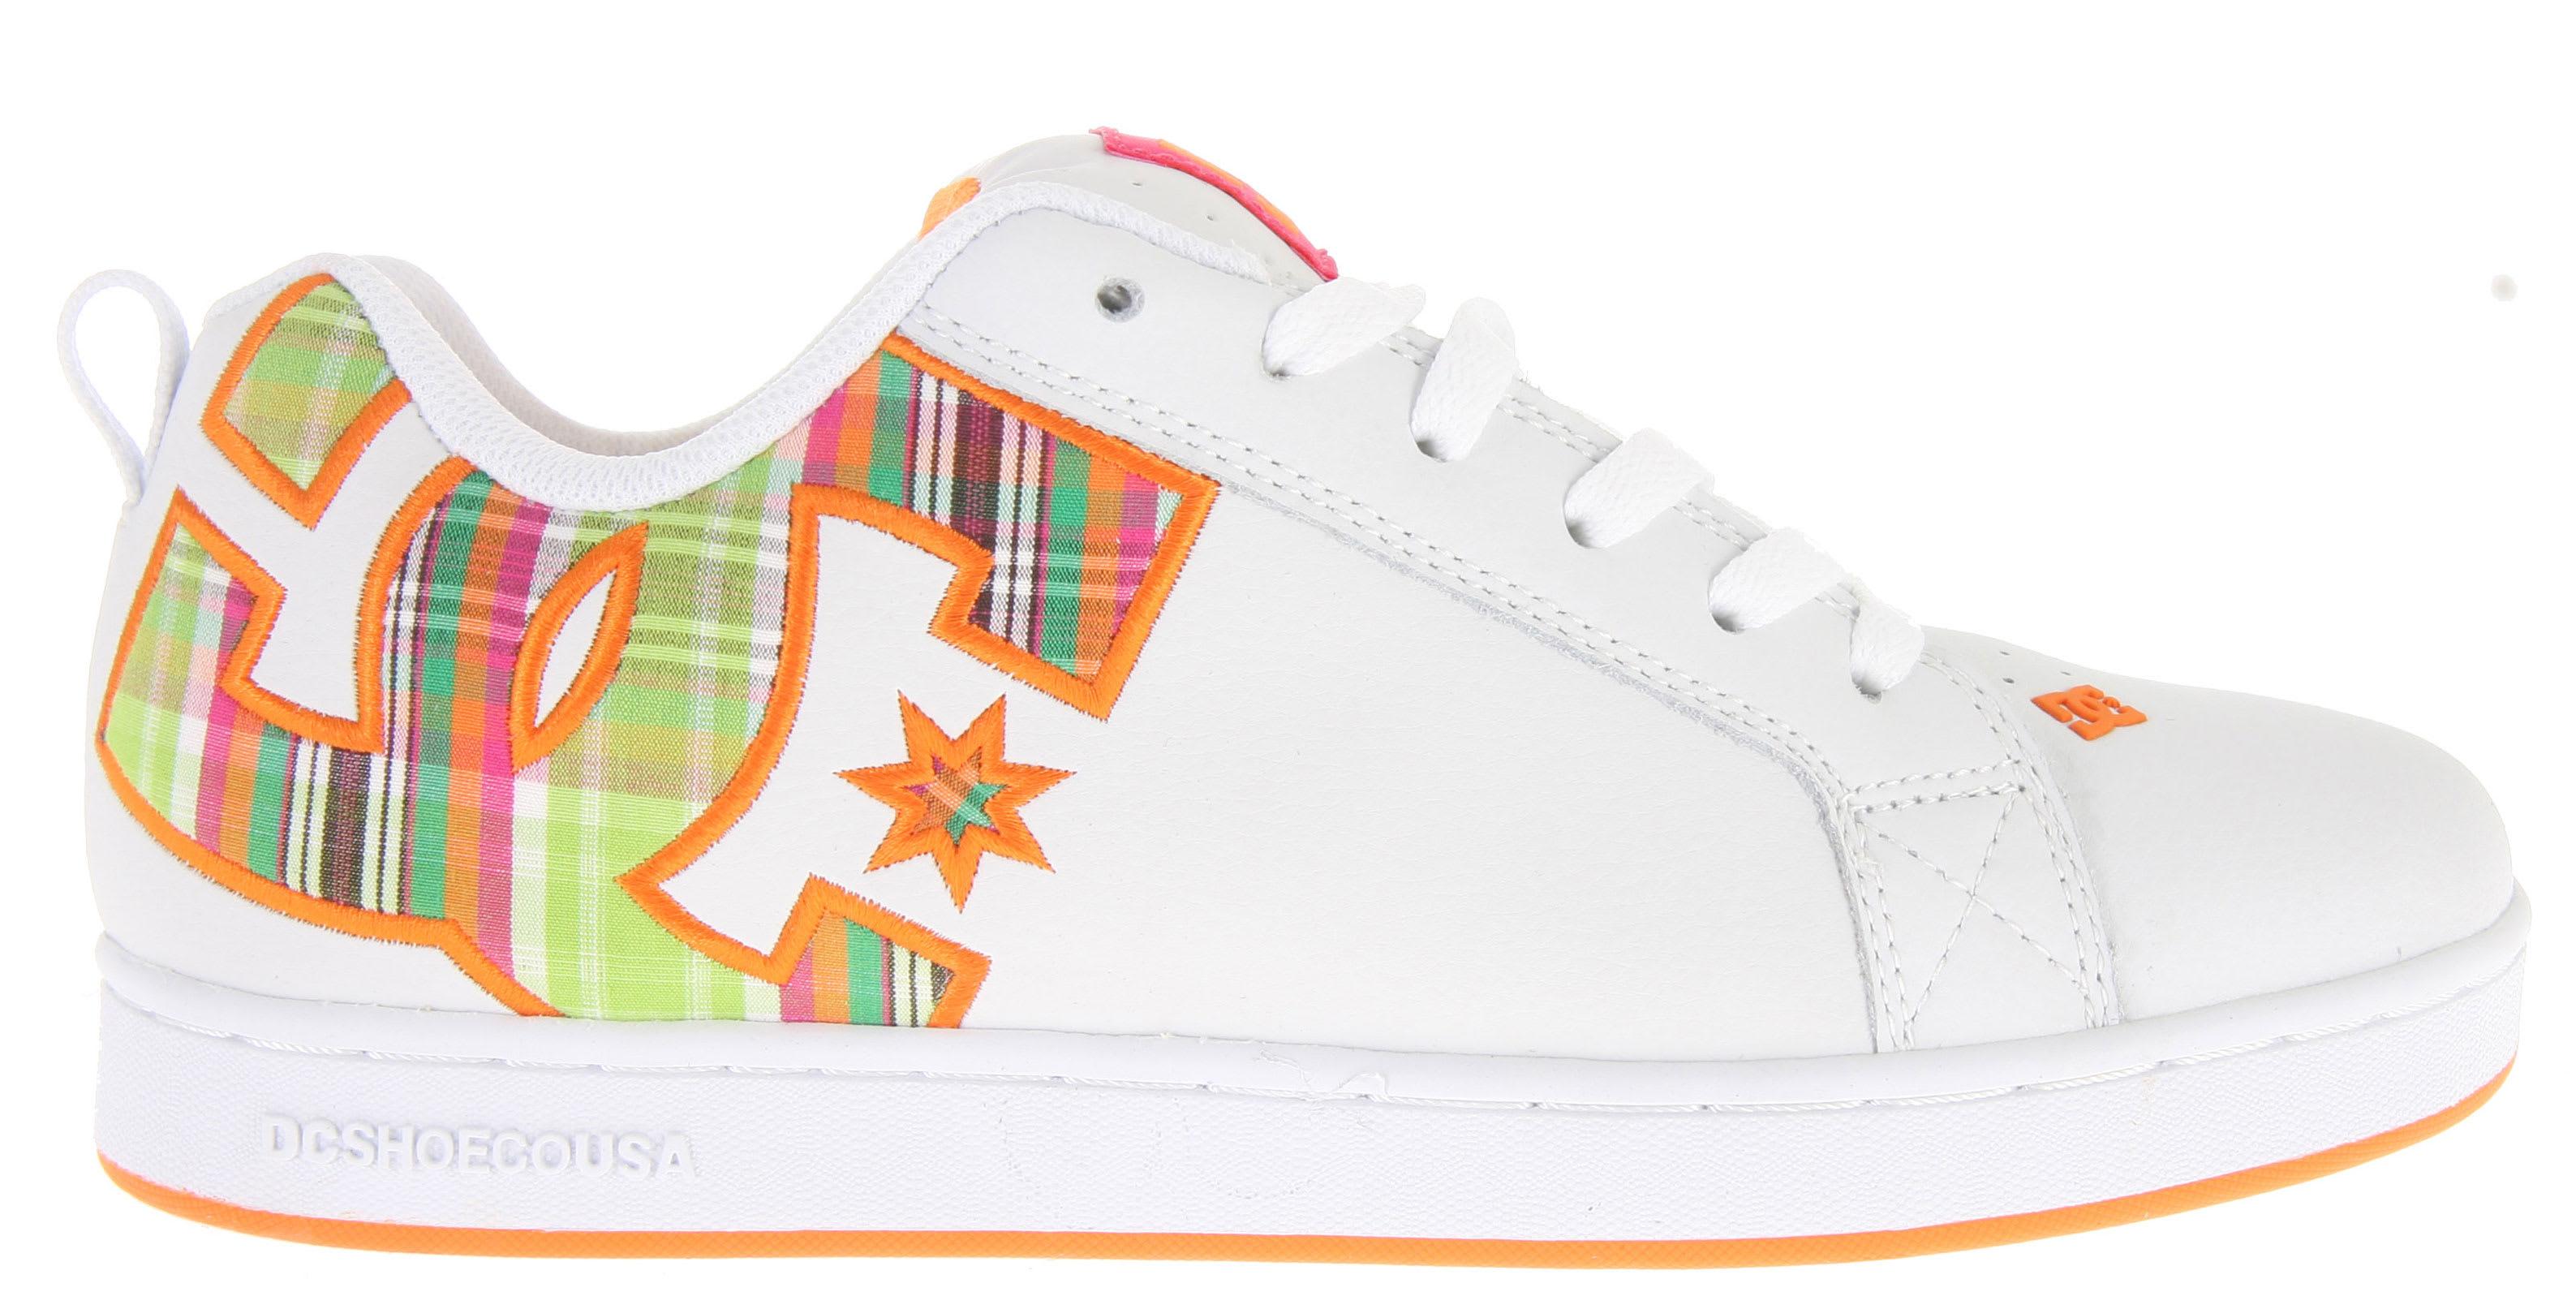 Womens Skateboard Shoes